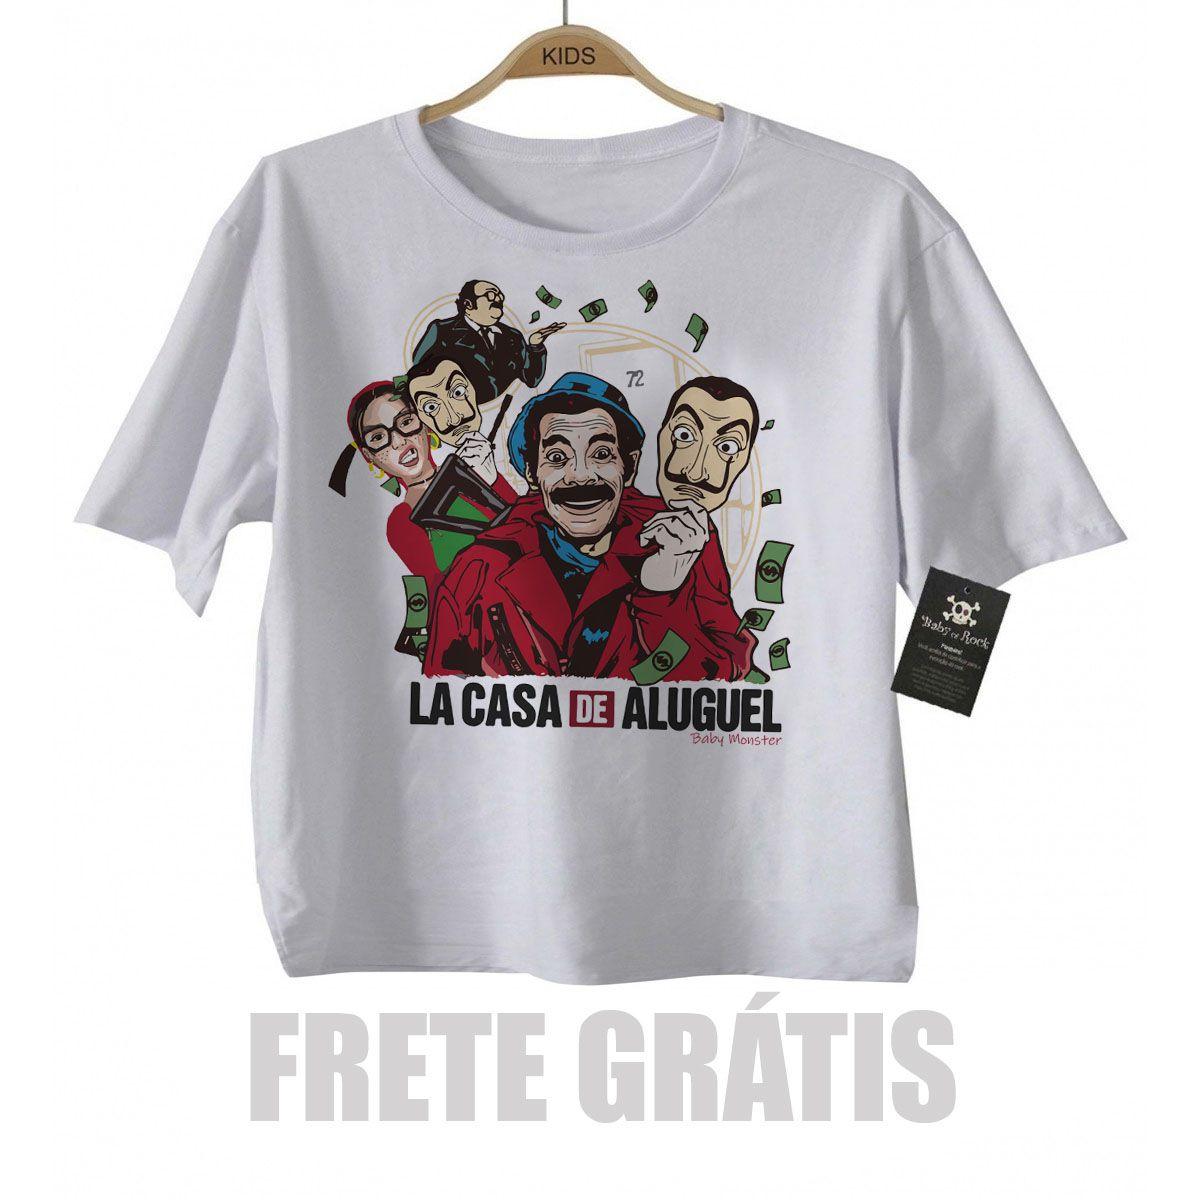 Camiseta Infantil Series La casa de Aluguel - Seu Madruga  - Baby Monster S/A